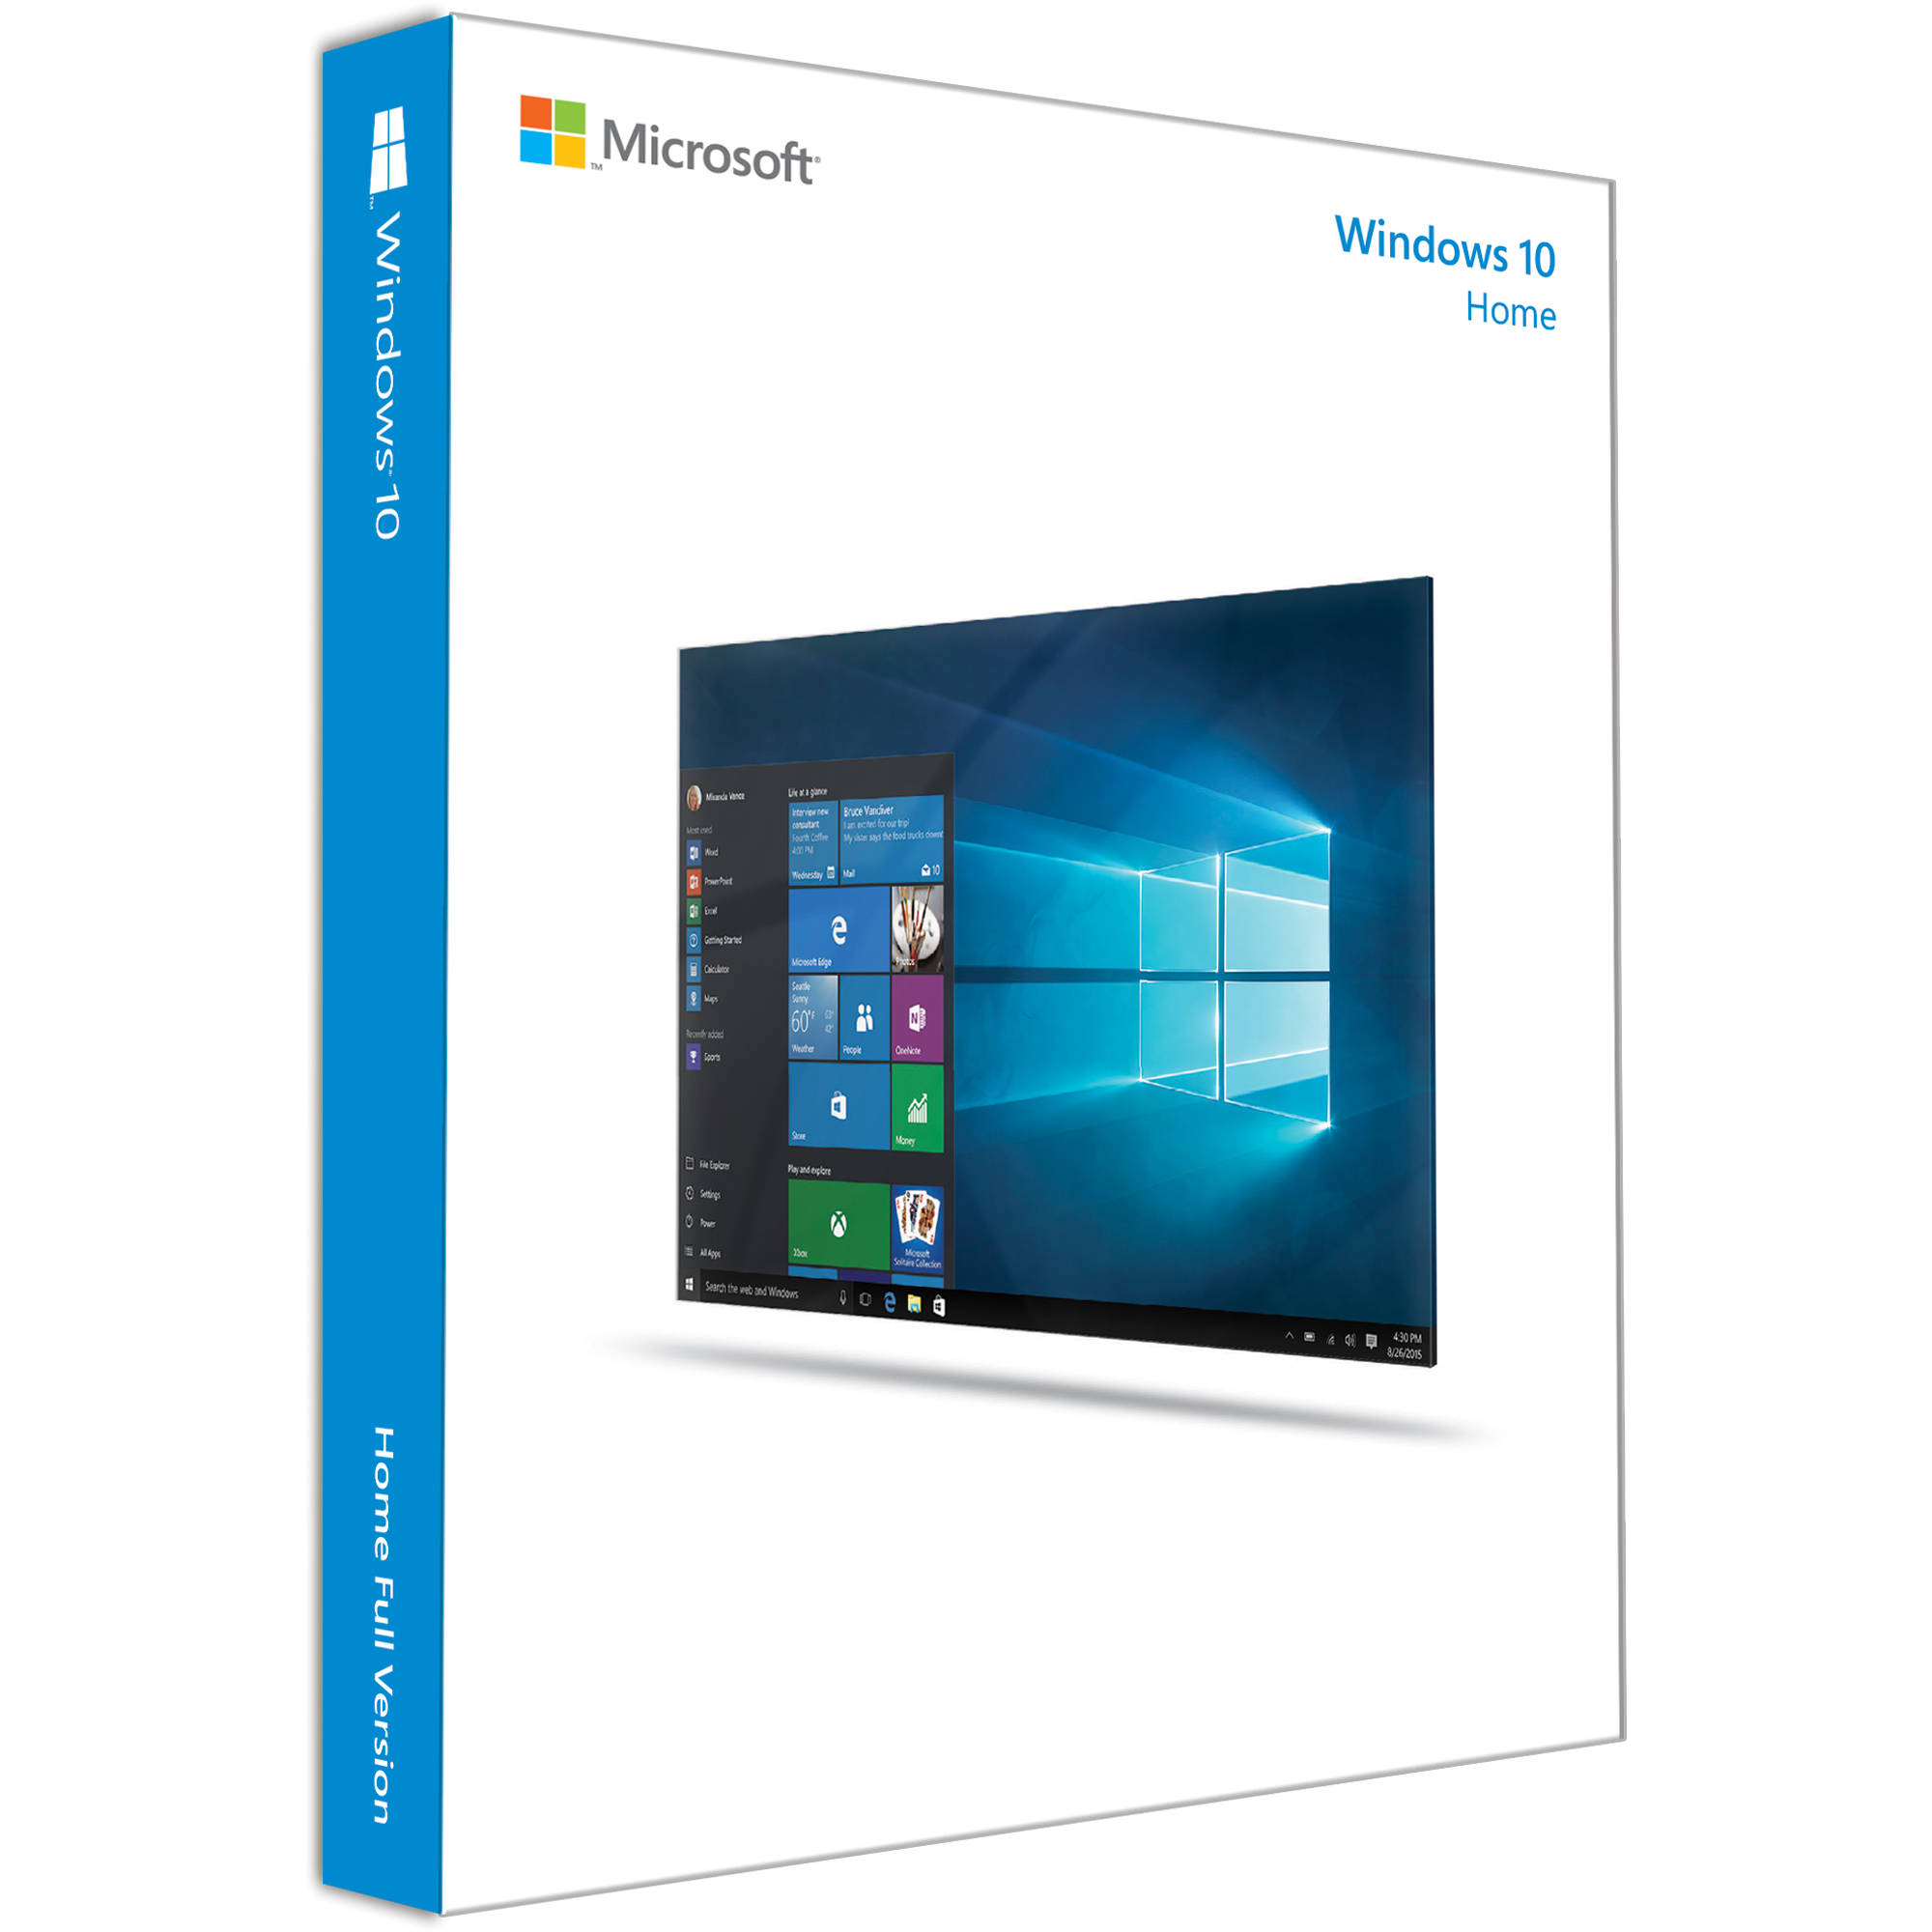 Microsoft Windows 10 Home 64 Bit Oem Dvd Kw9 00140 B H